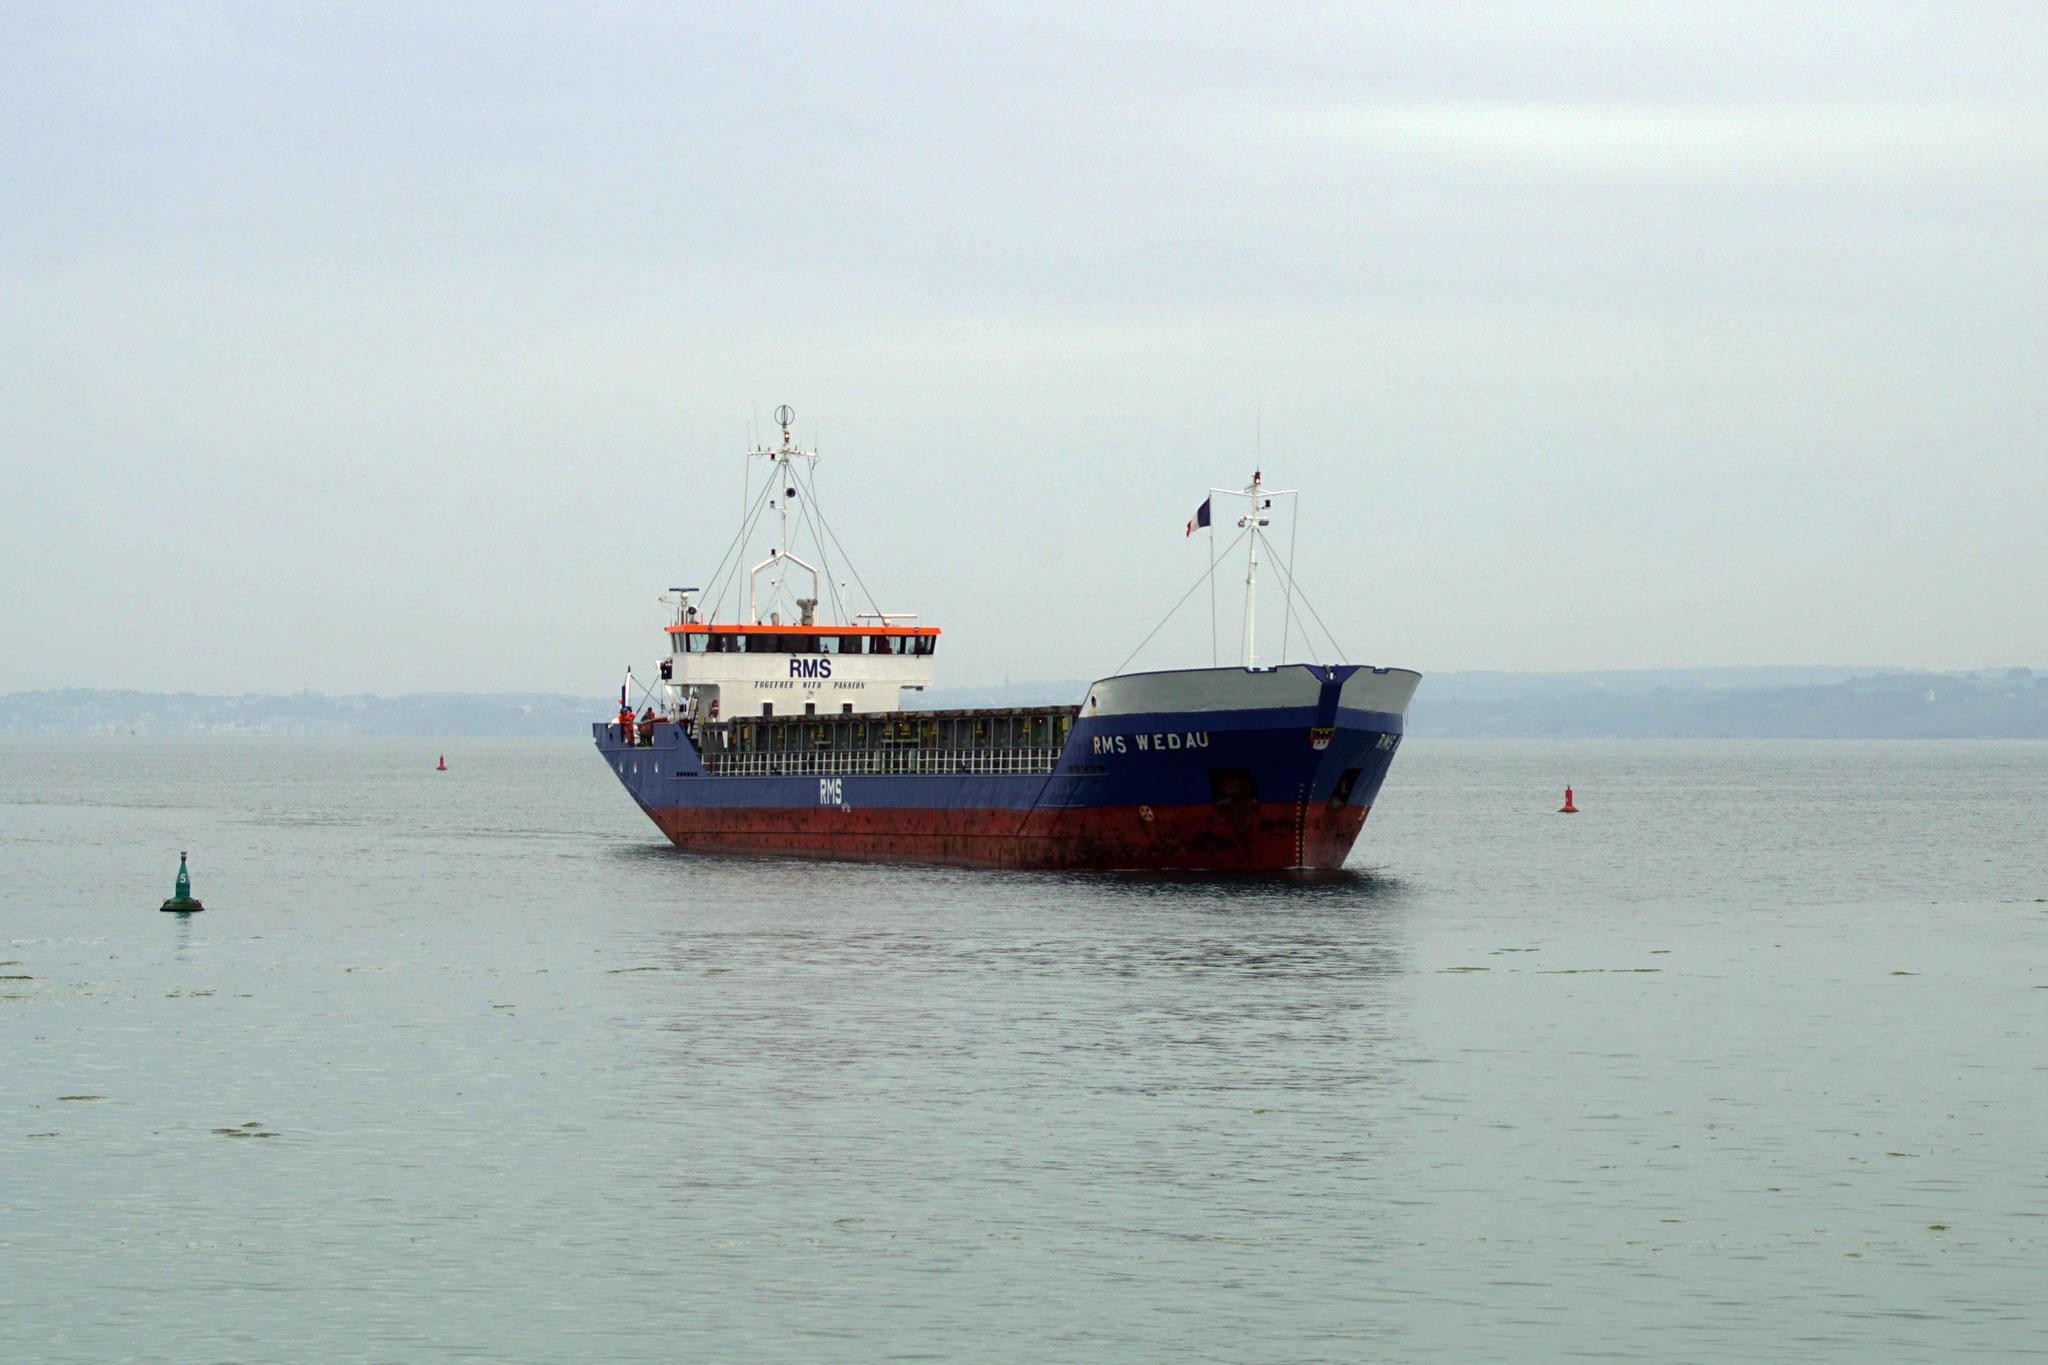 RMS Wedau, DSC02898